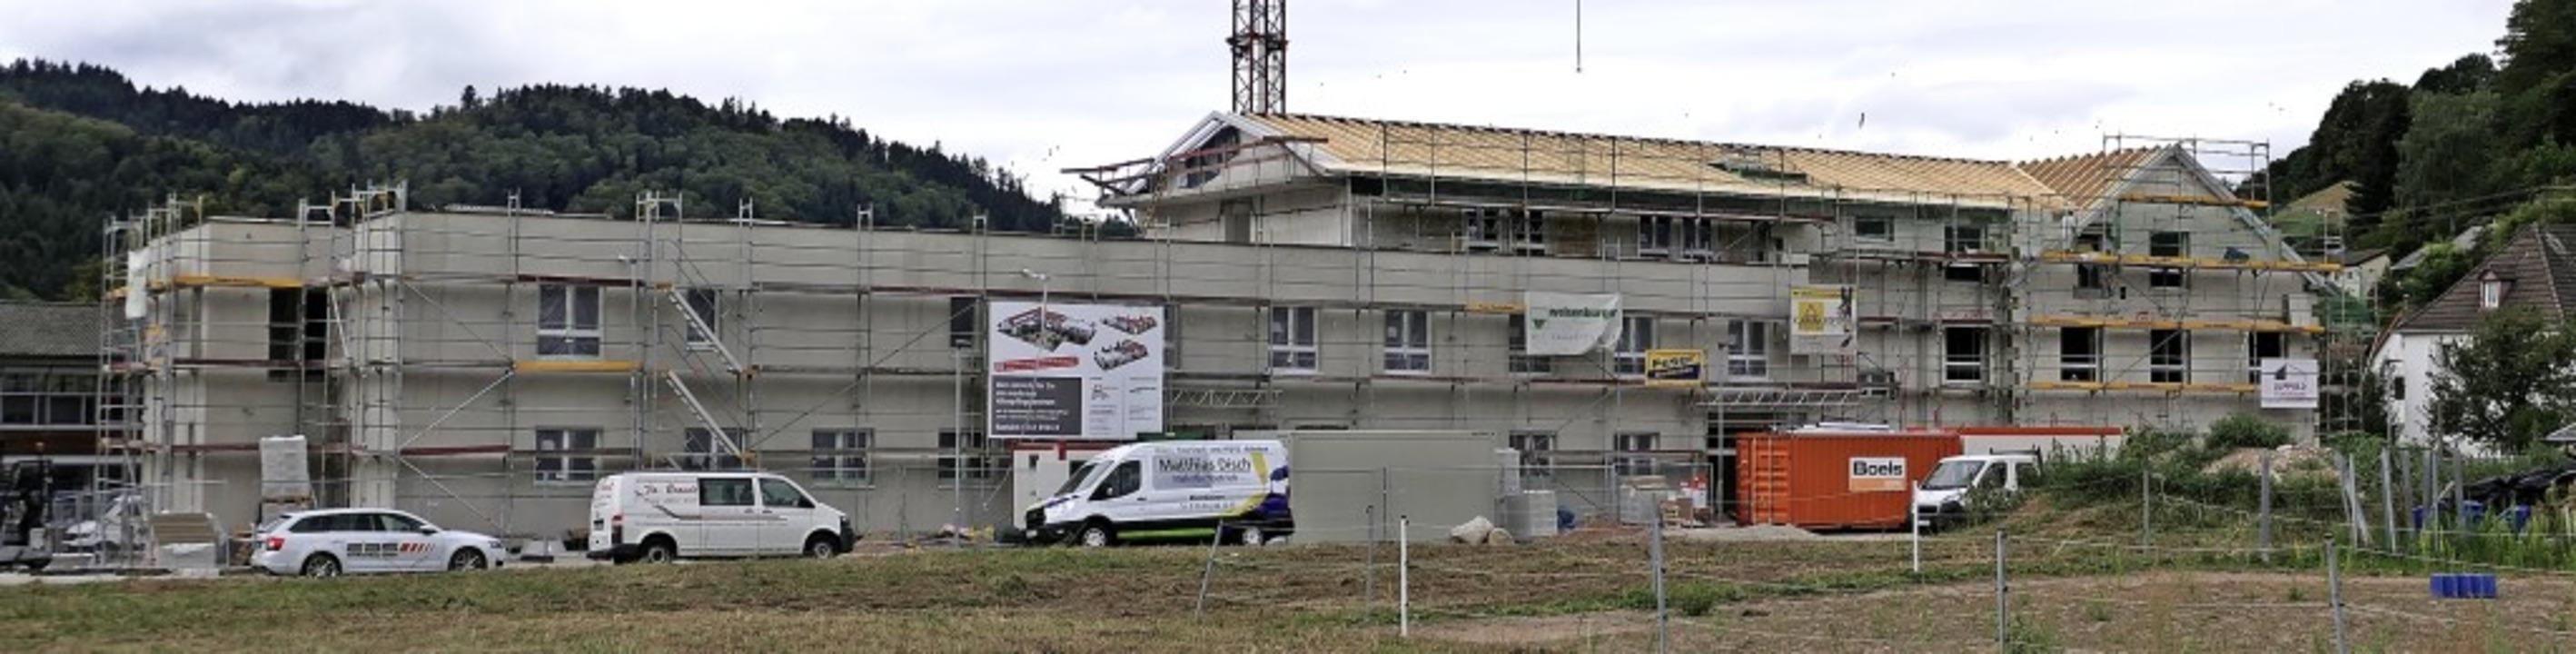 Derzeit wichtigstes Neubauprojekt:  Ca...smitte   neben der Abt-Columban-Schule  | Foto: Hans-Peter Müller